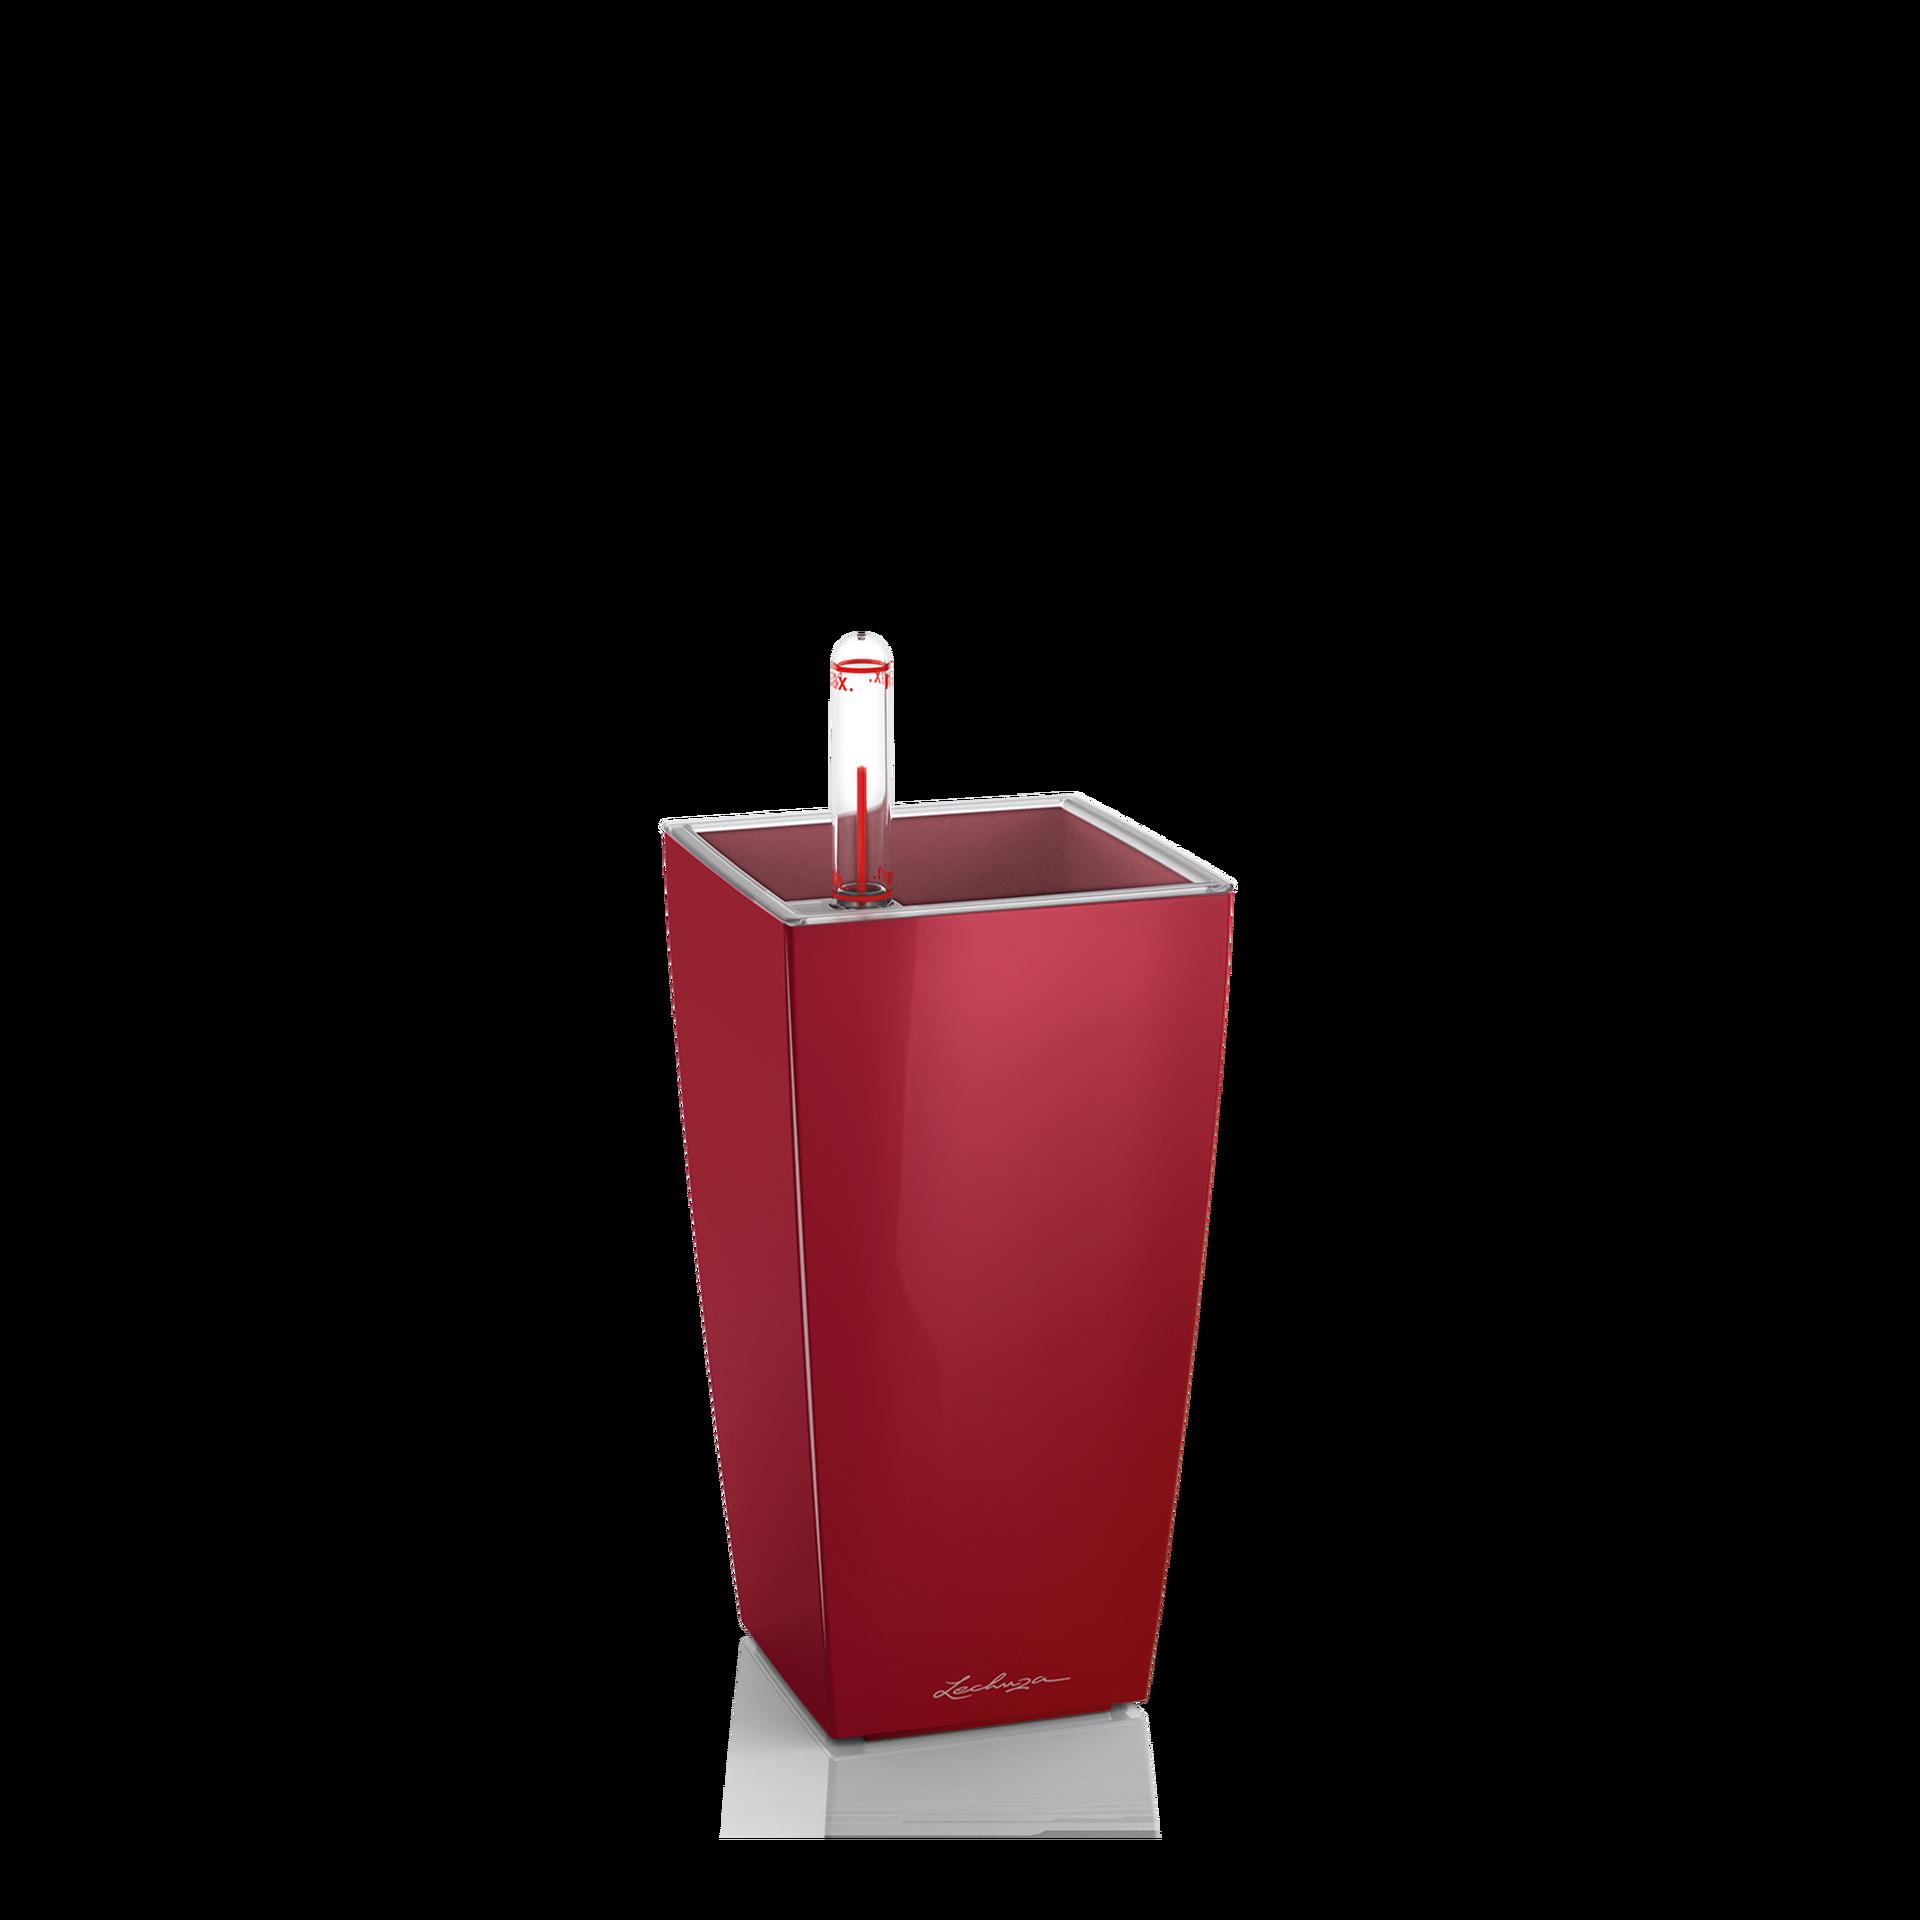 MINI-CUBI scarlet rot hochglanz